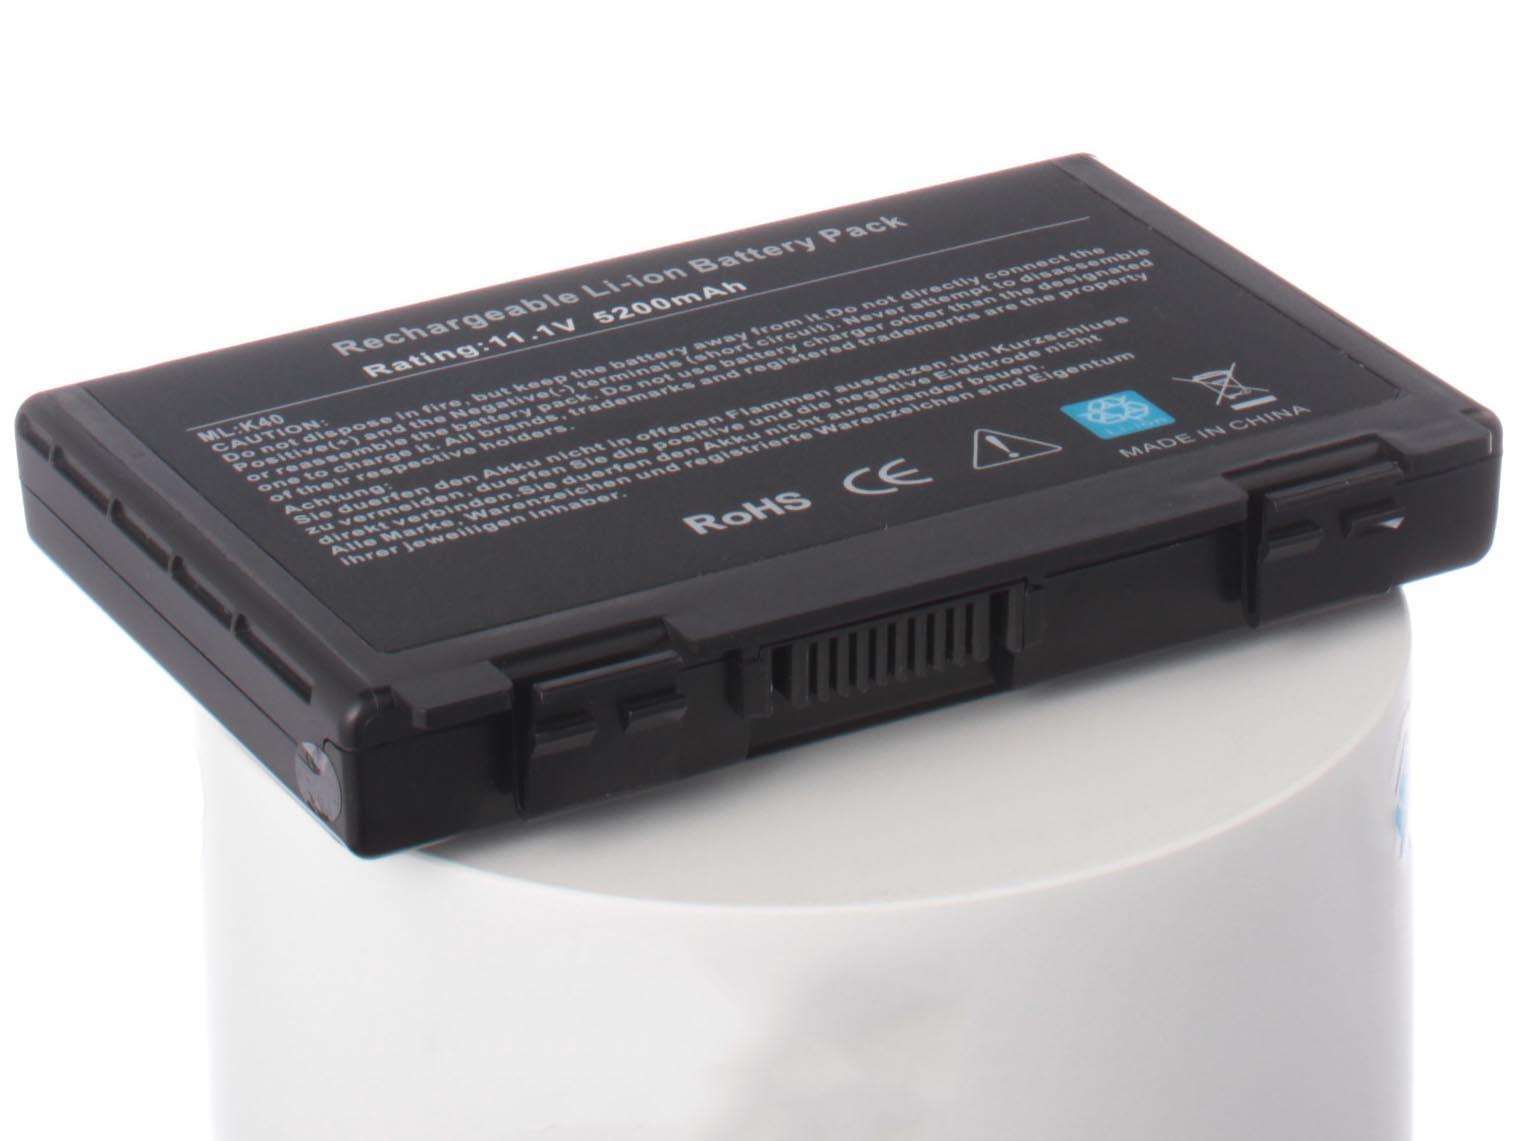 Аккумулятор для ноутбука iBatt Asus A32-F82, A32-F52, L0690L6, 90-NVD1B1000Y, CS-AUF82NB, iB-A145, iB-A145H, iB-A145X, TOP-K50, 11-1145, A31-F52, A32-K40, L0A2016 цена